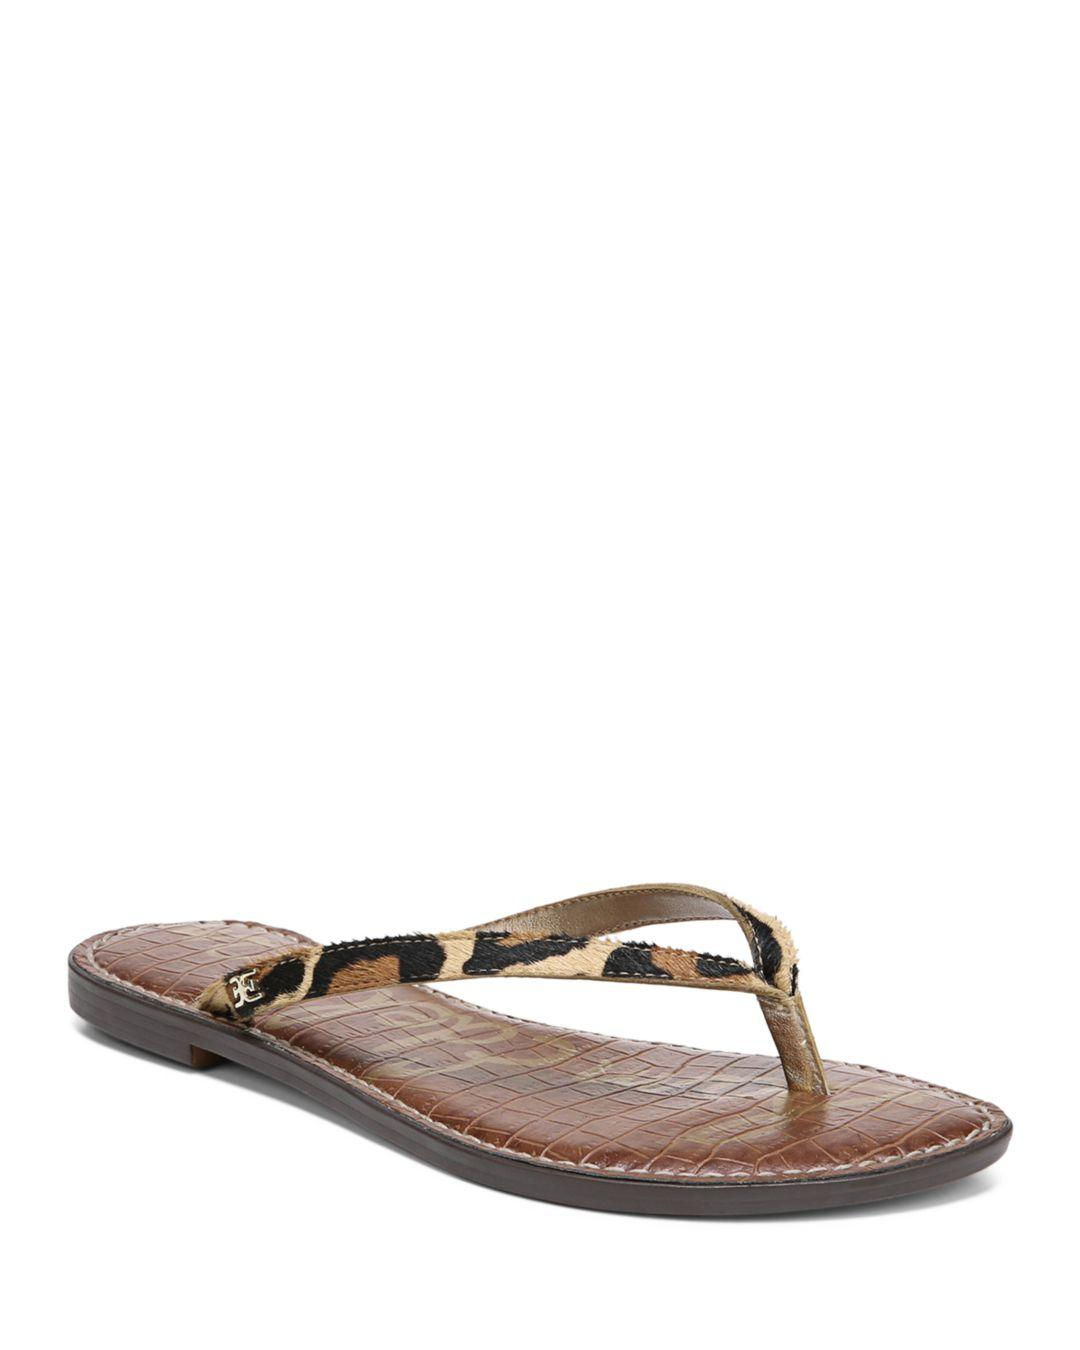 7c383977cea1 Lyst - Sam Edelman Women s Gracie Flip-flops